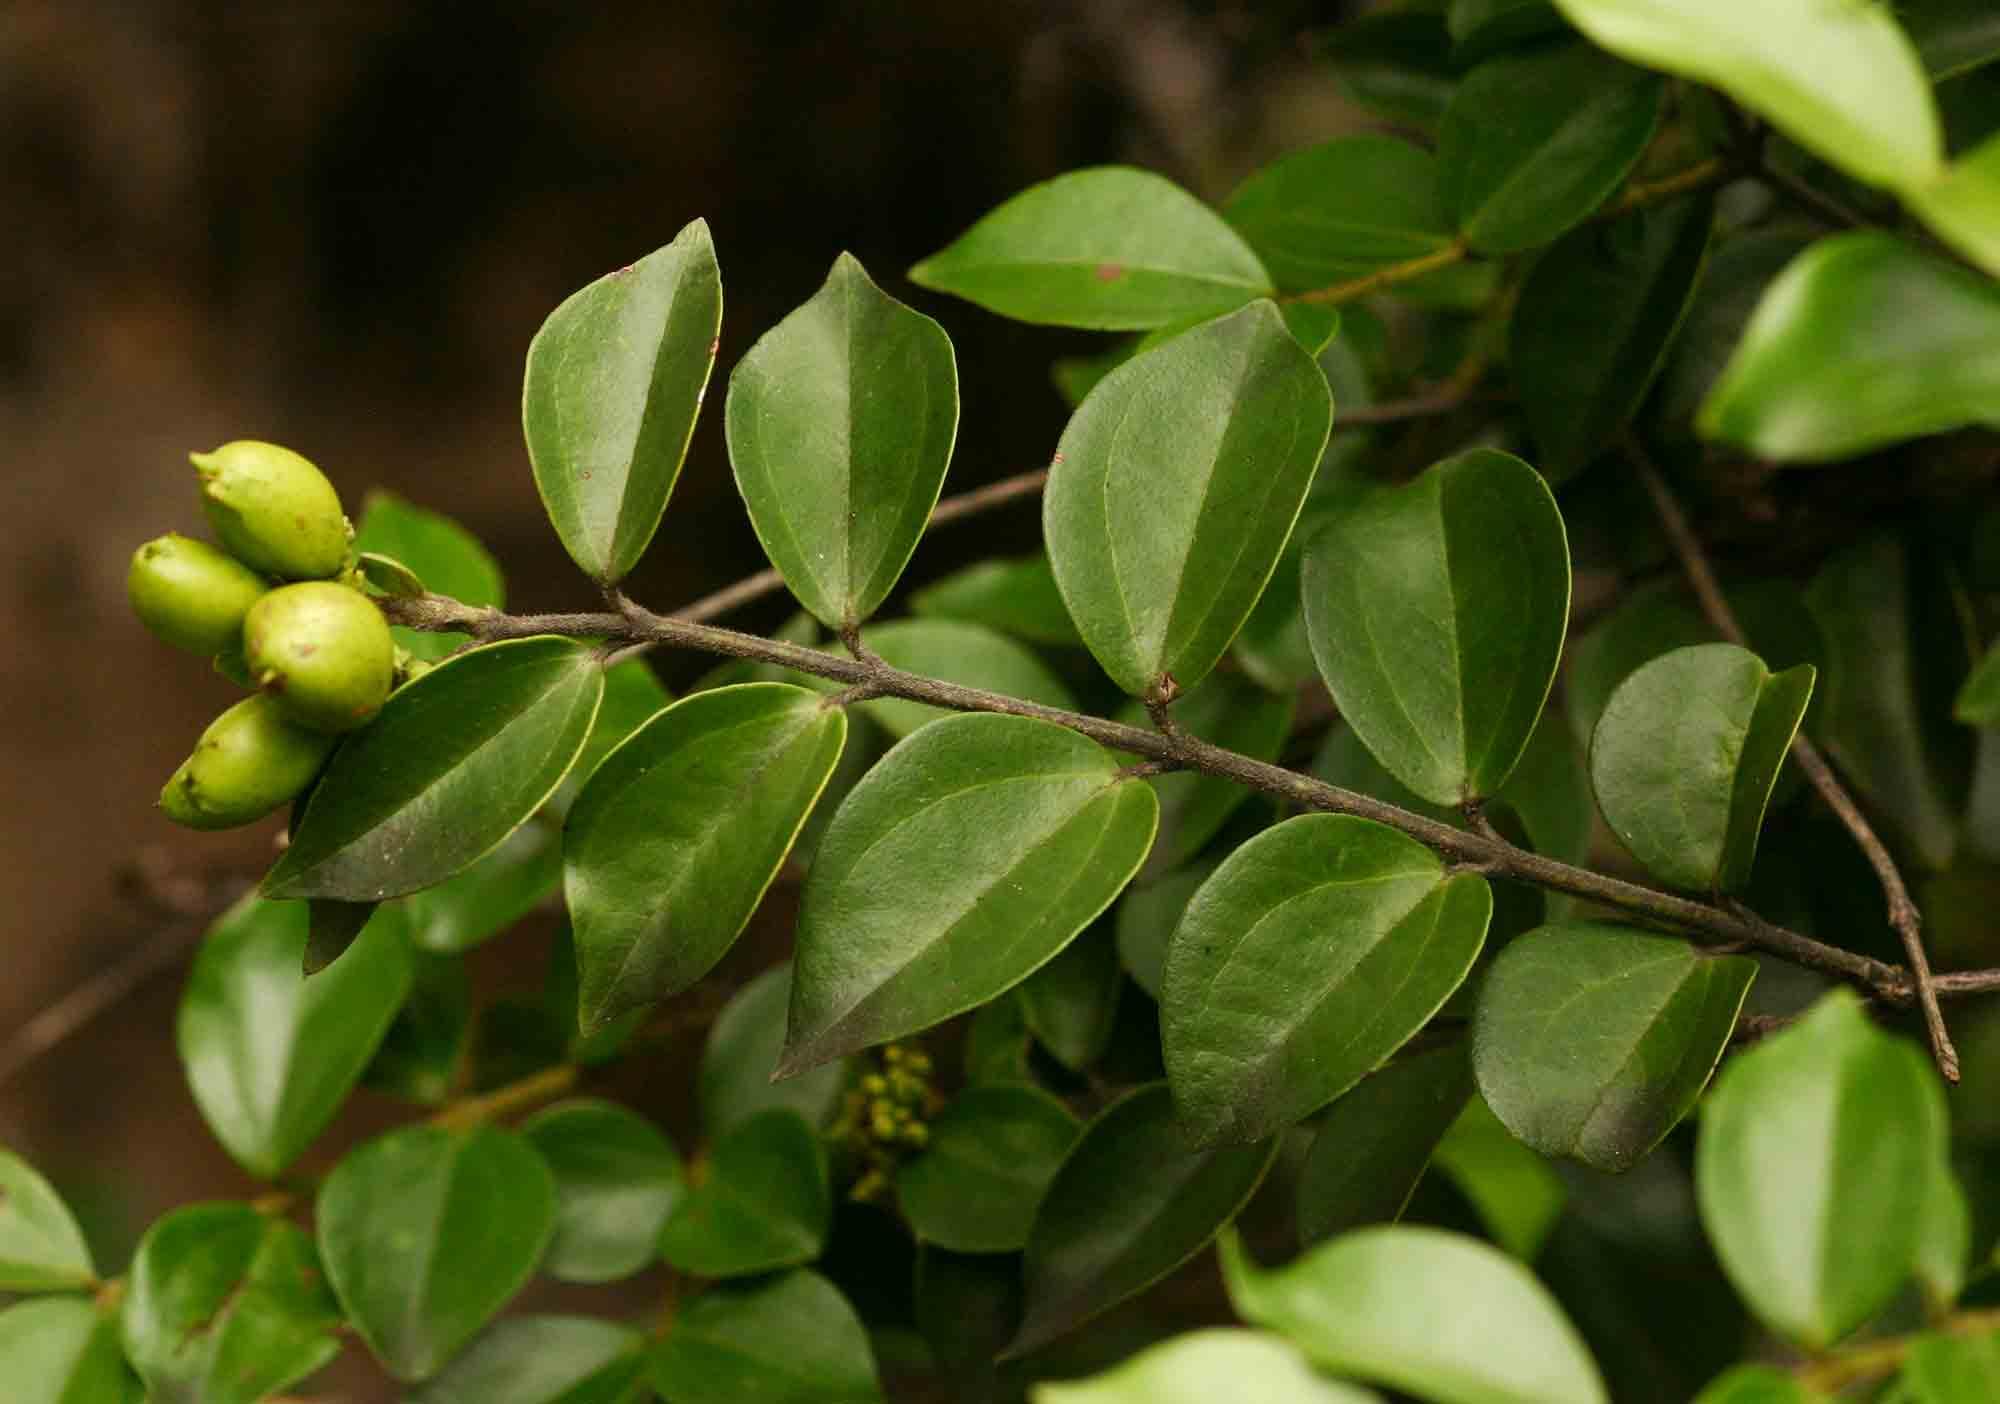 Strychnos matopensis